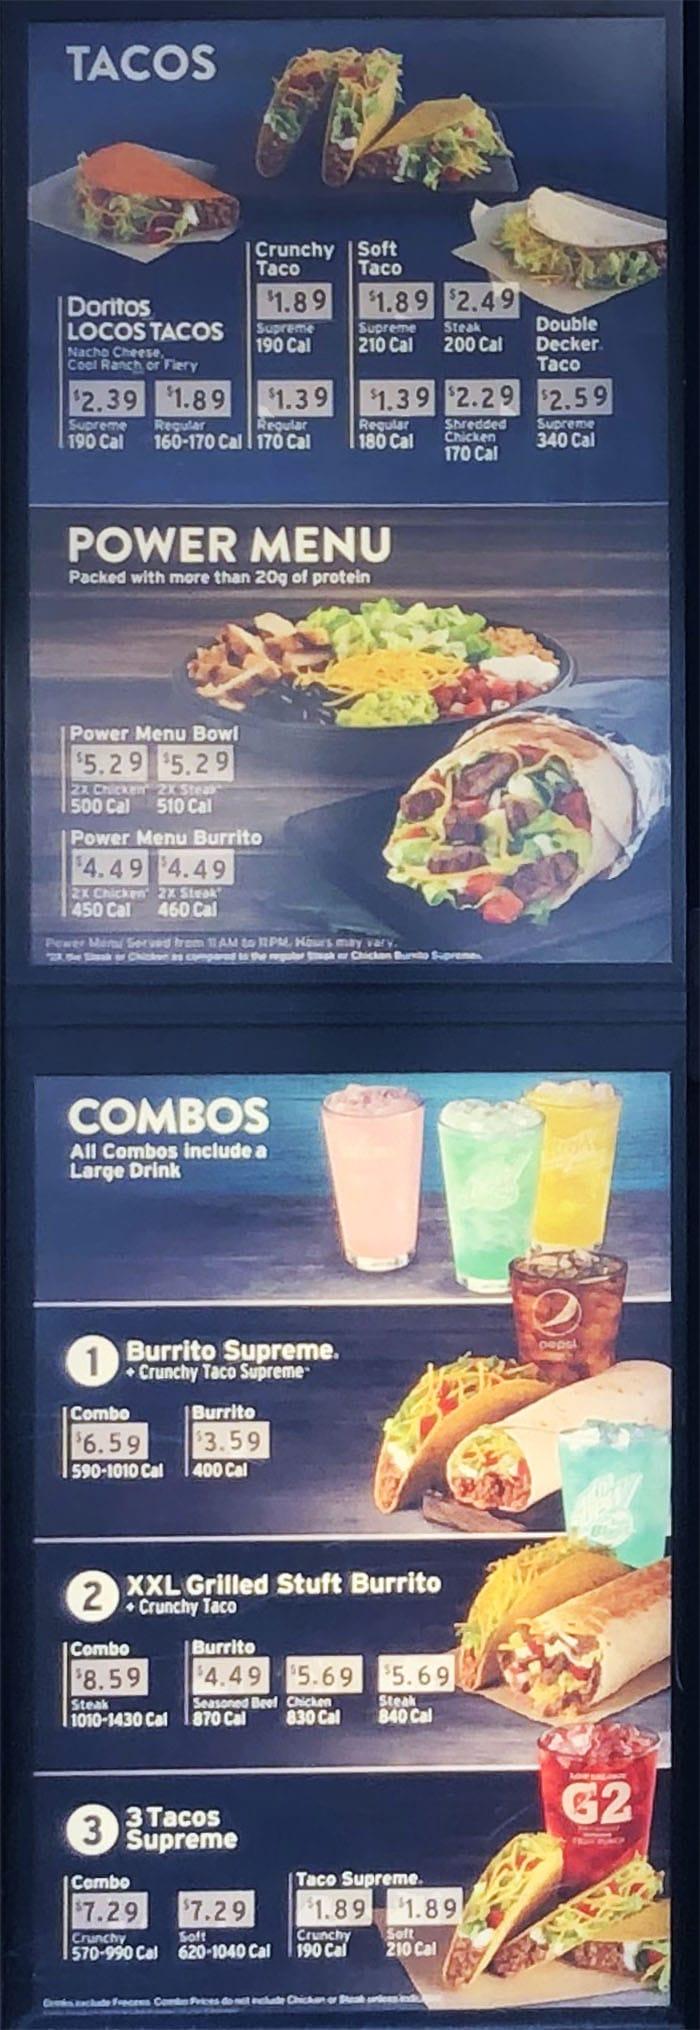 Taco Bell menu - tacos, combos